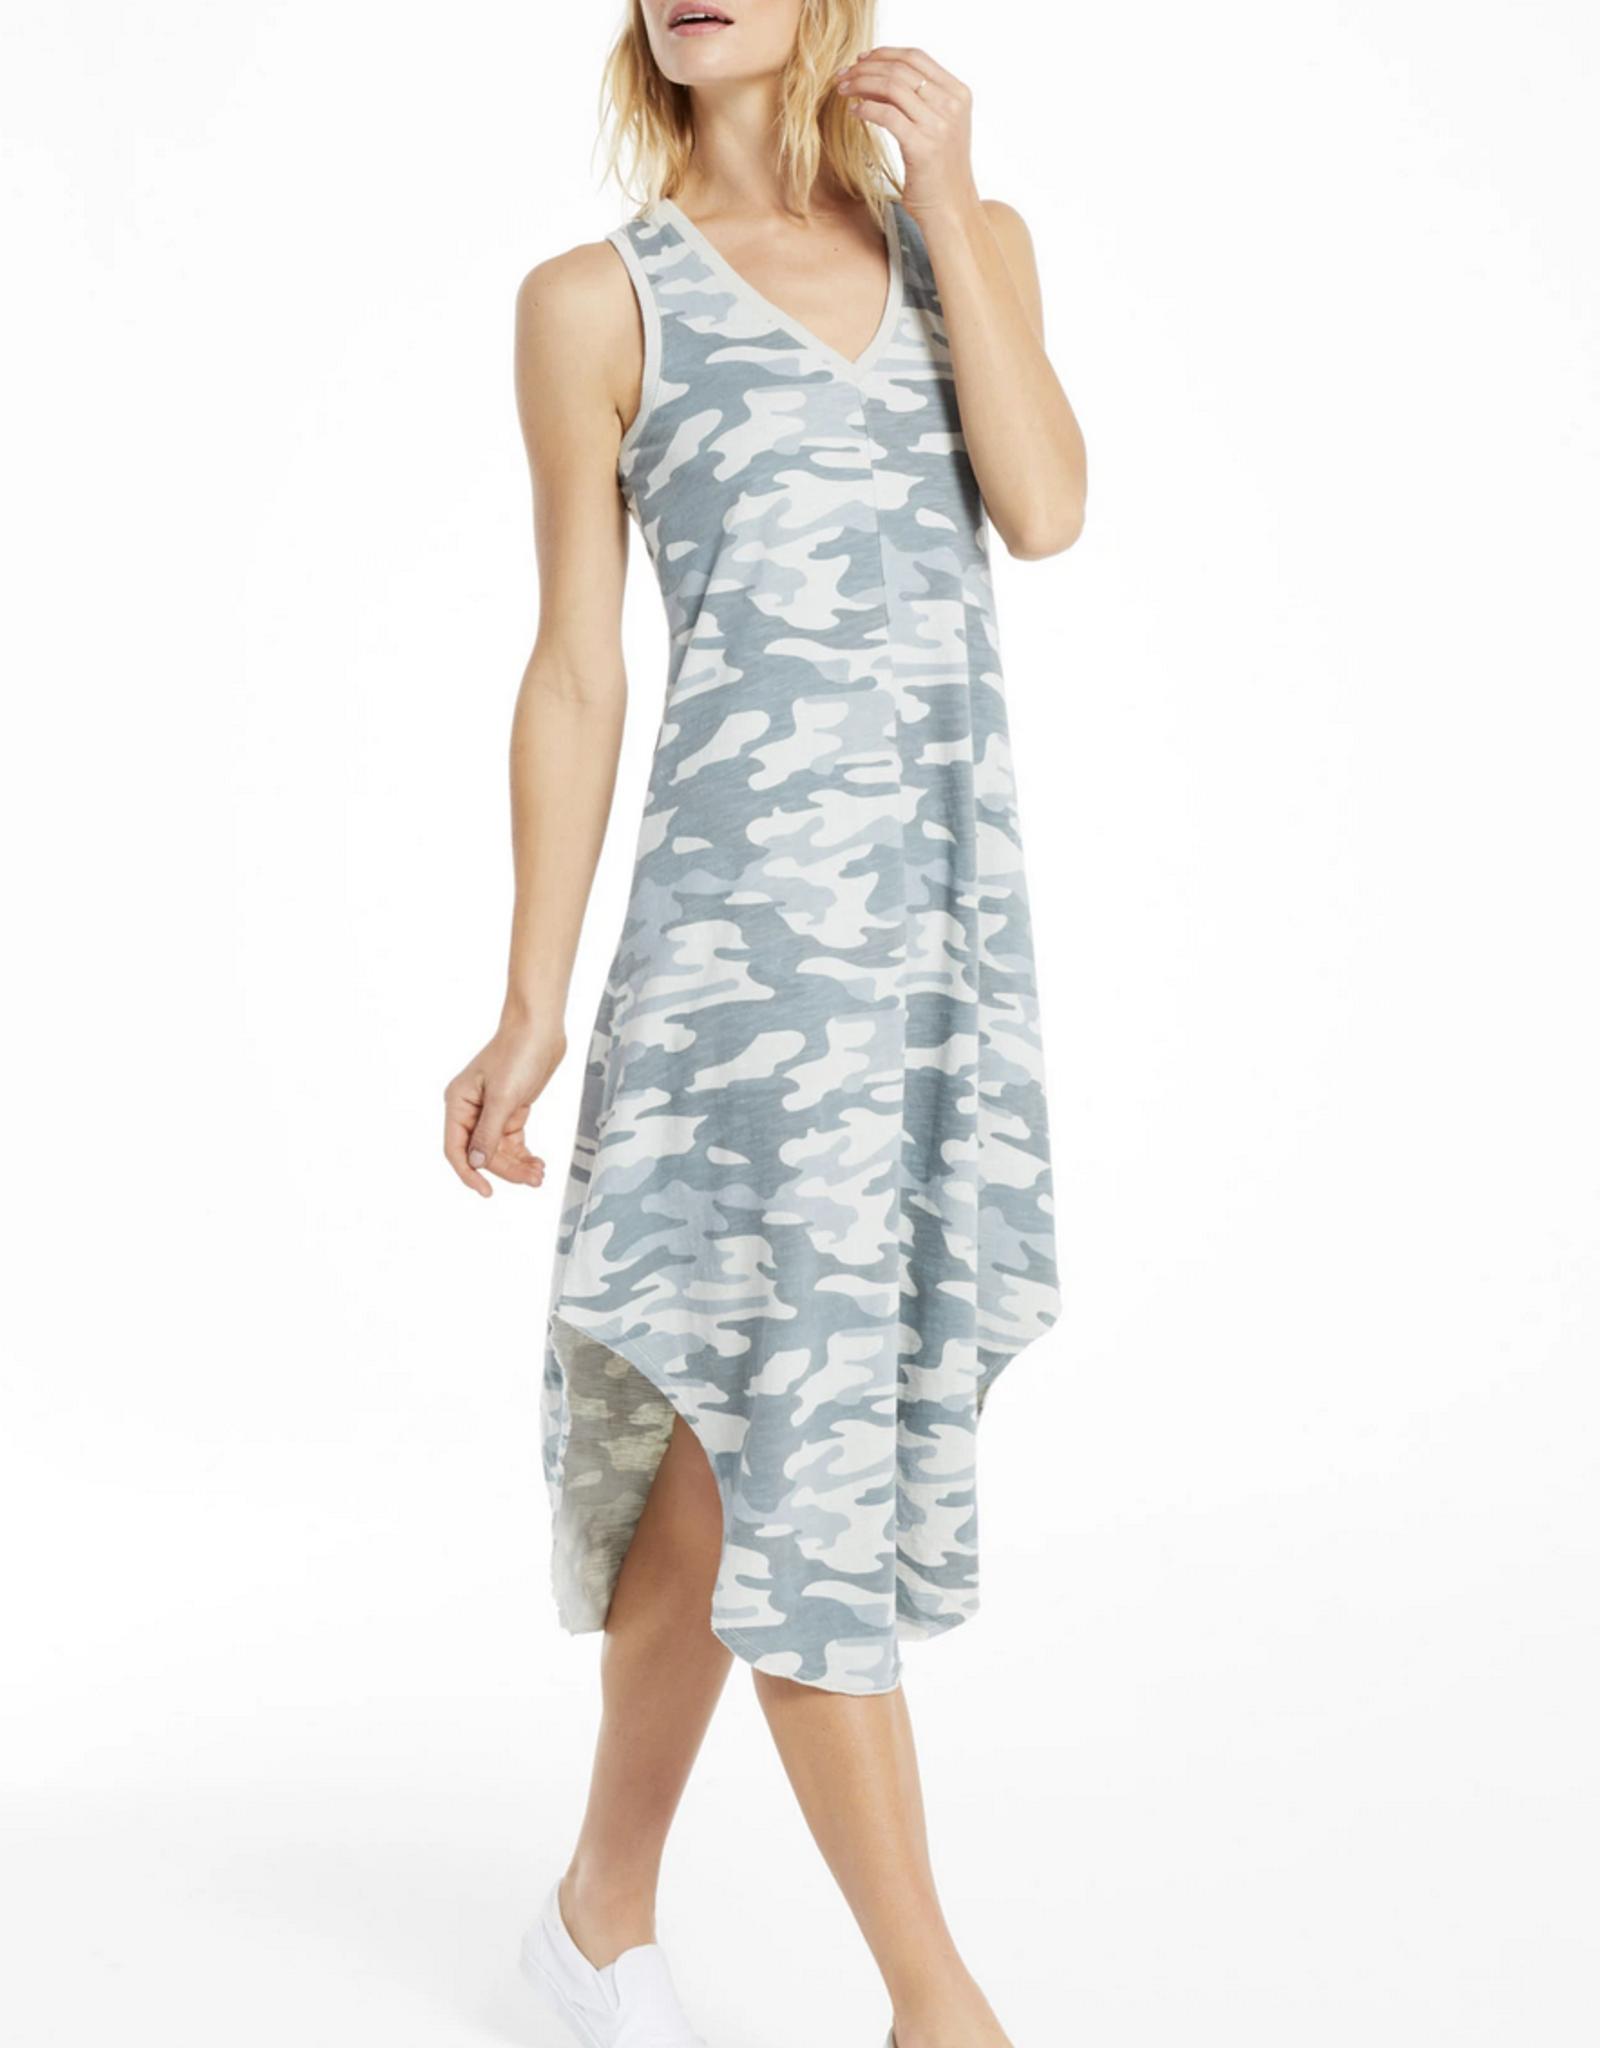 Z Supply Camo Reverie Dress